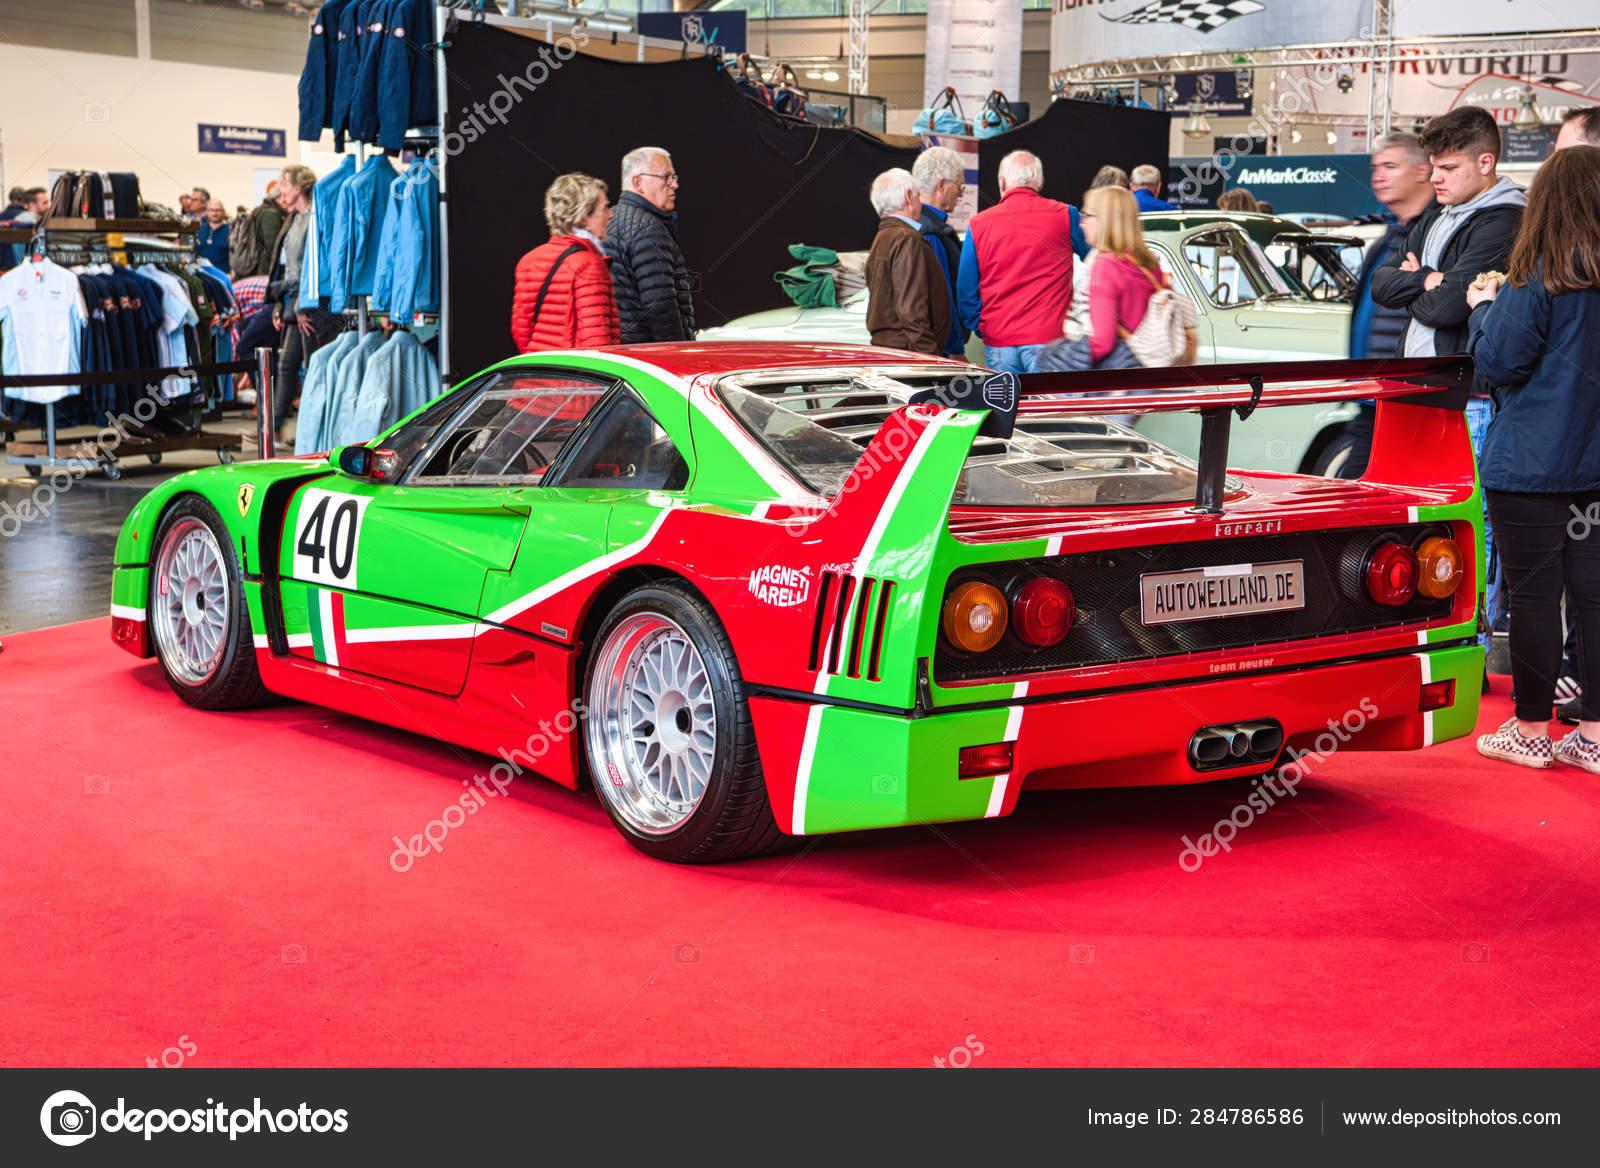 Friedrichshafen May 2019 Red Green Ferrari F40 1989 At Motorworld Classics Bodensee On May 11 2019 In Friedrichshafen Germany Stock Editorial Photo C Eagle2308 284786586